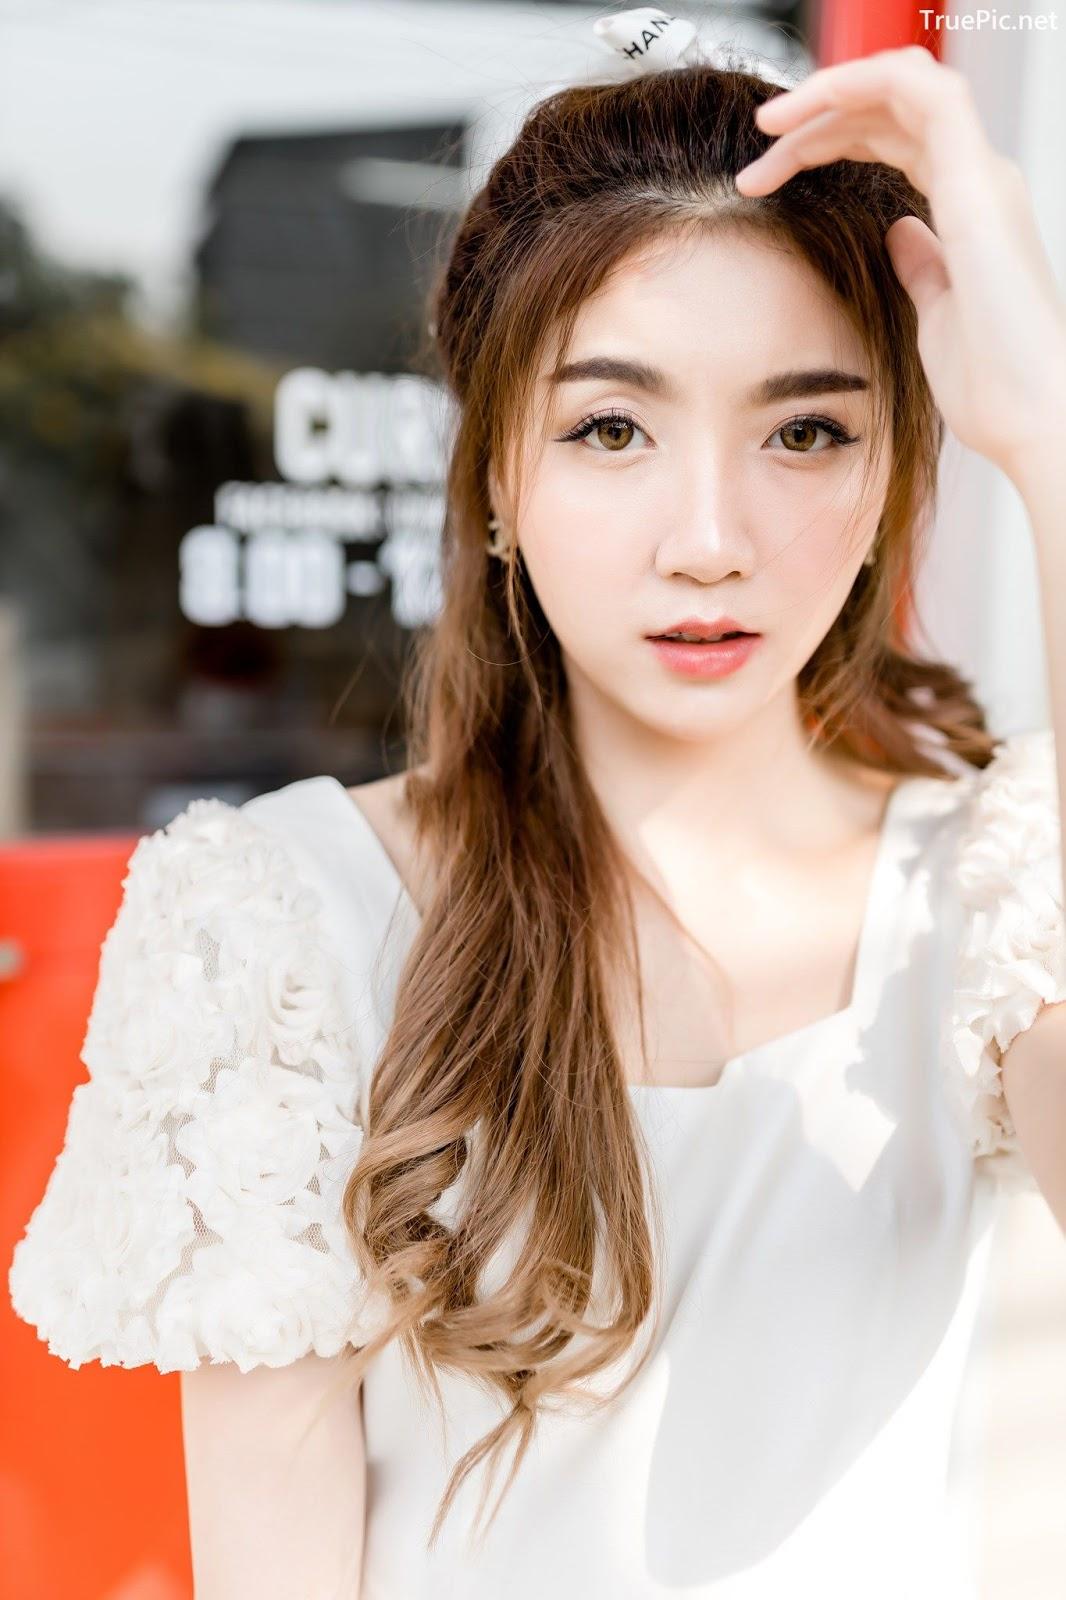 Image Thailand Model - Sasi Ngiunwan - Barbie Doll Smile - TruePic.net - Picture-4